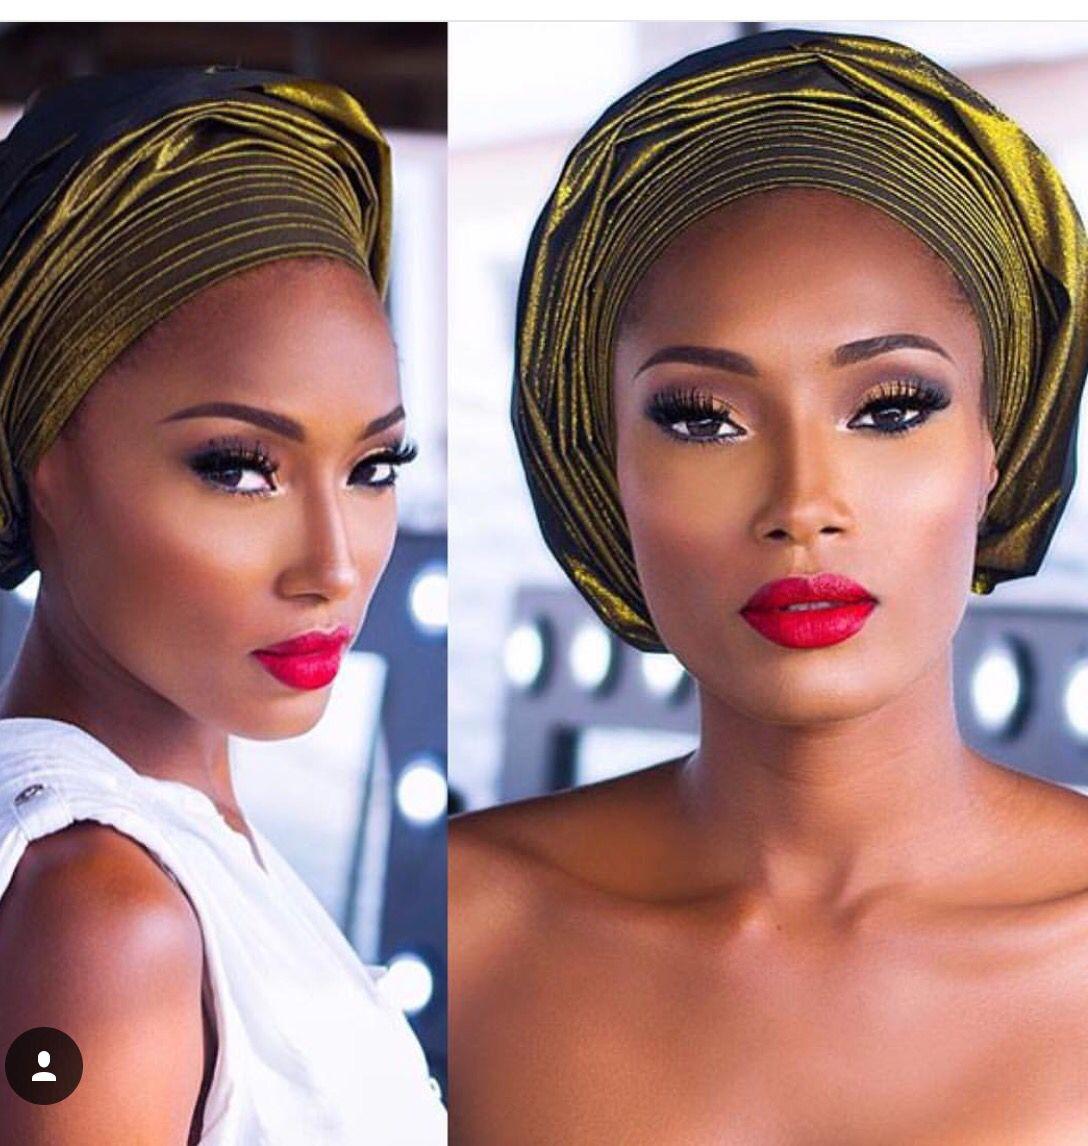 Makeup for black women Makeup for black women, Red